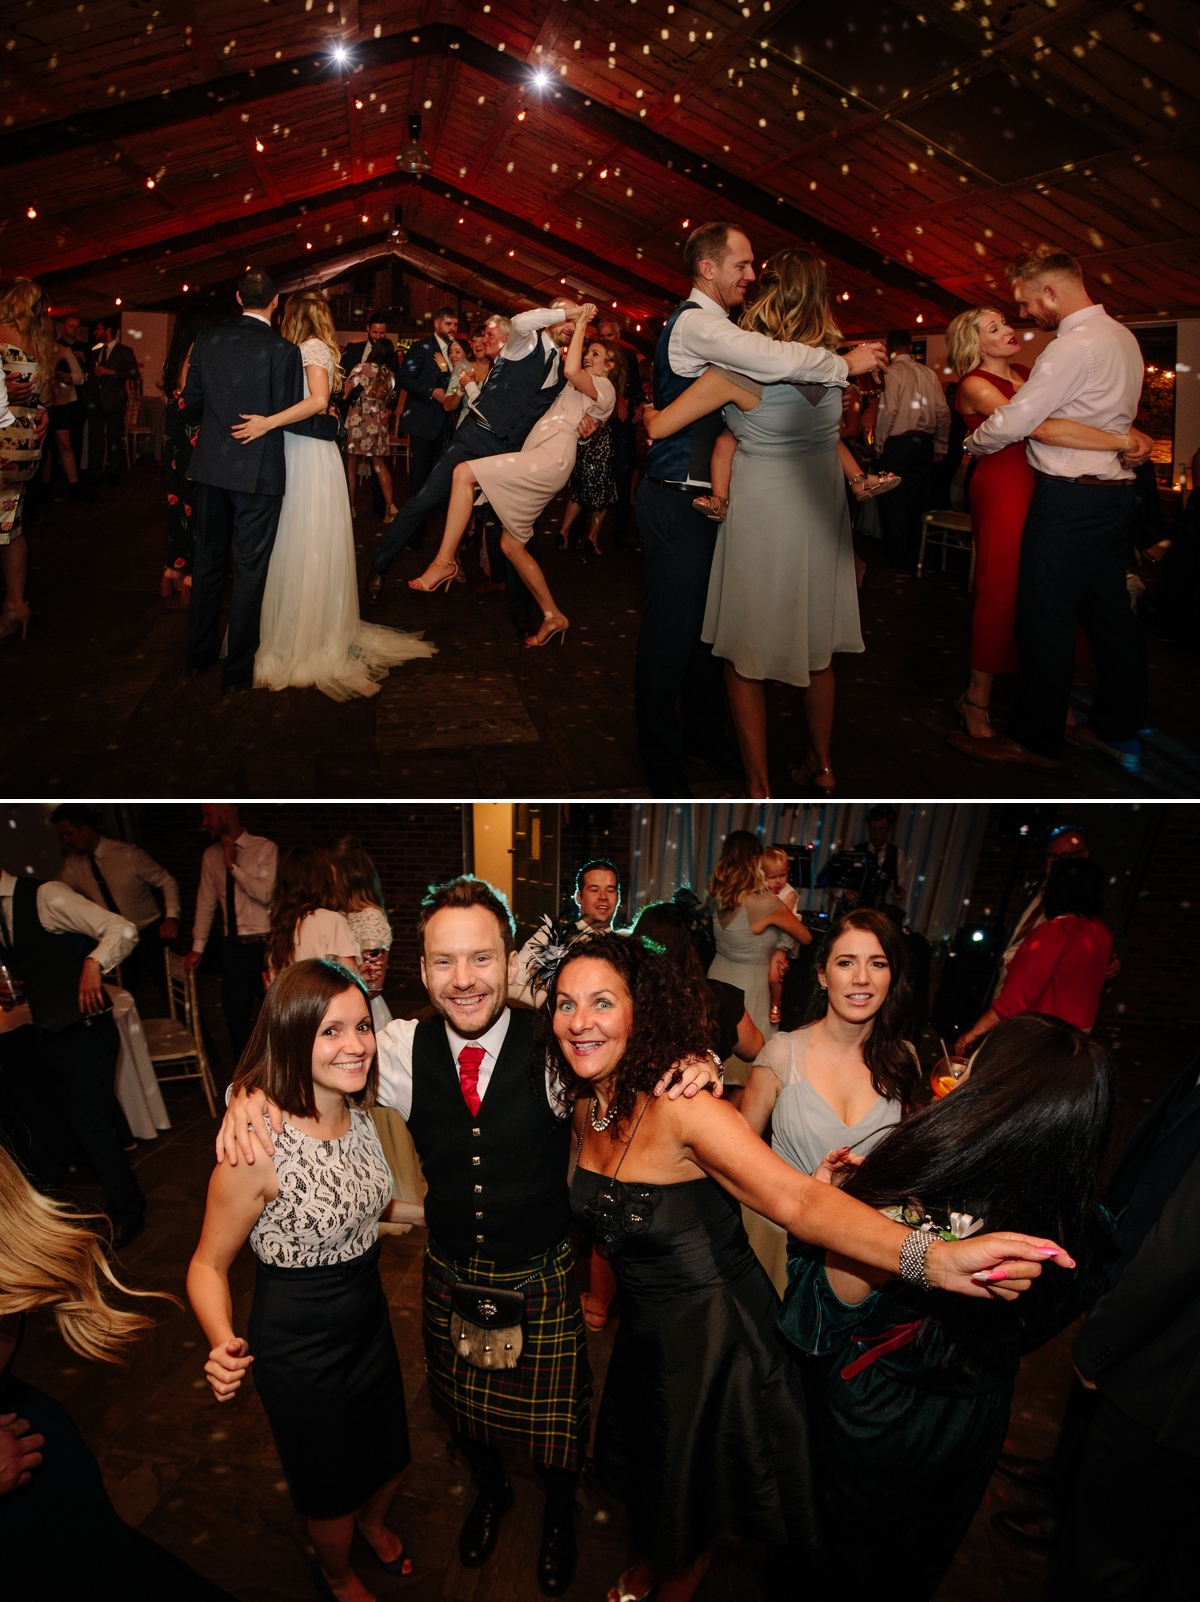 Wedding guests dancing having fun